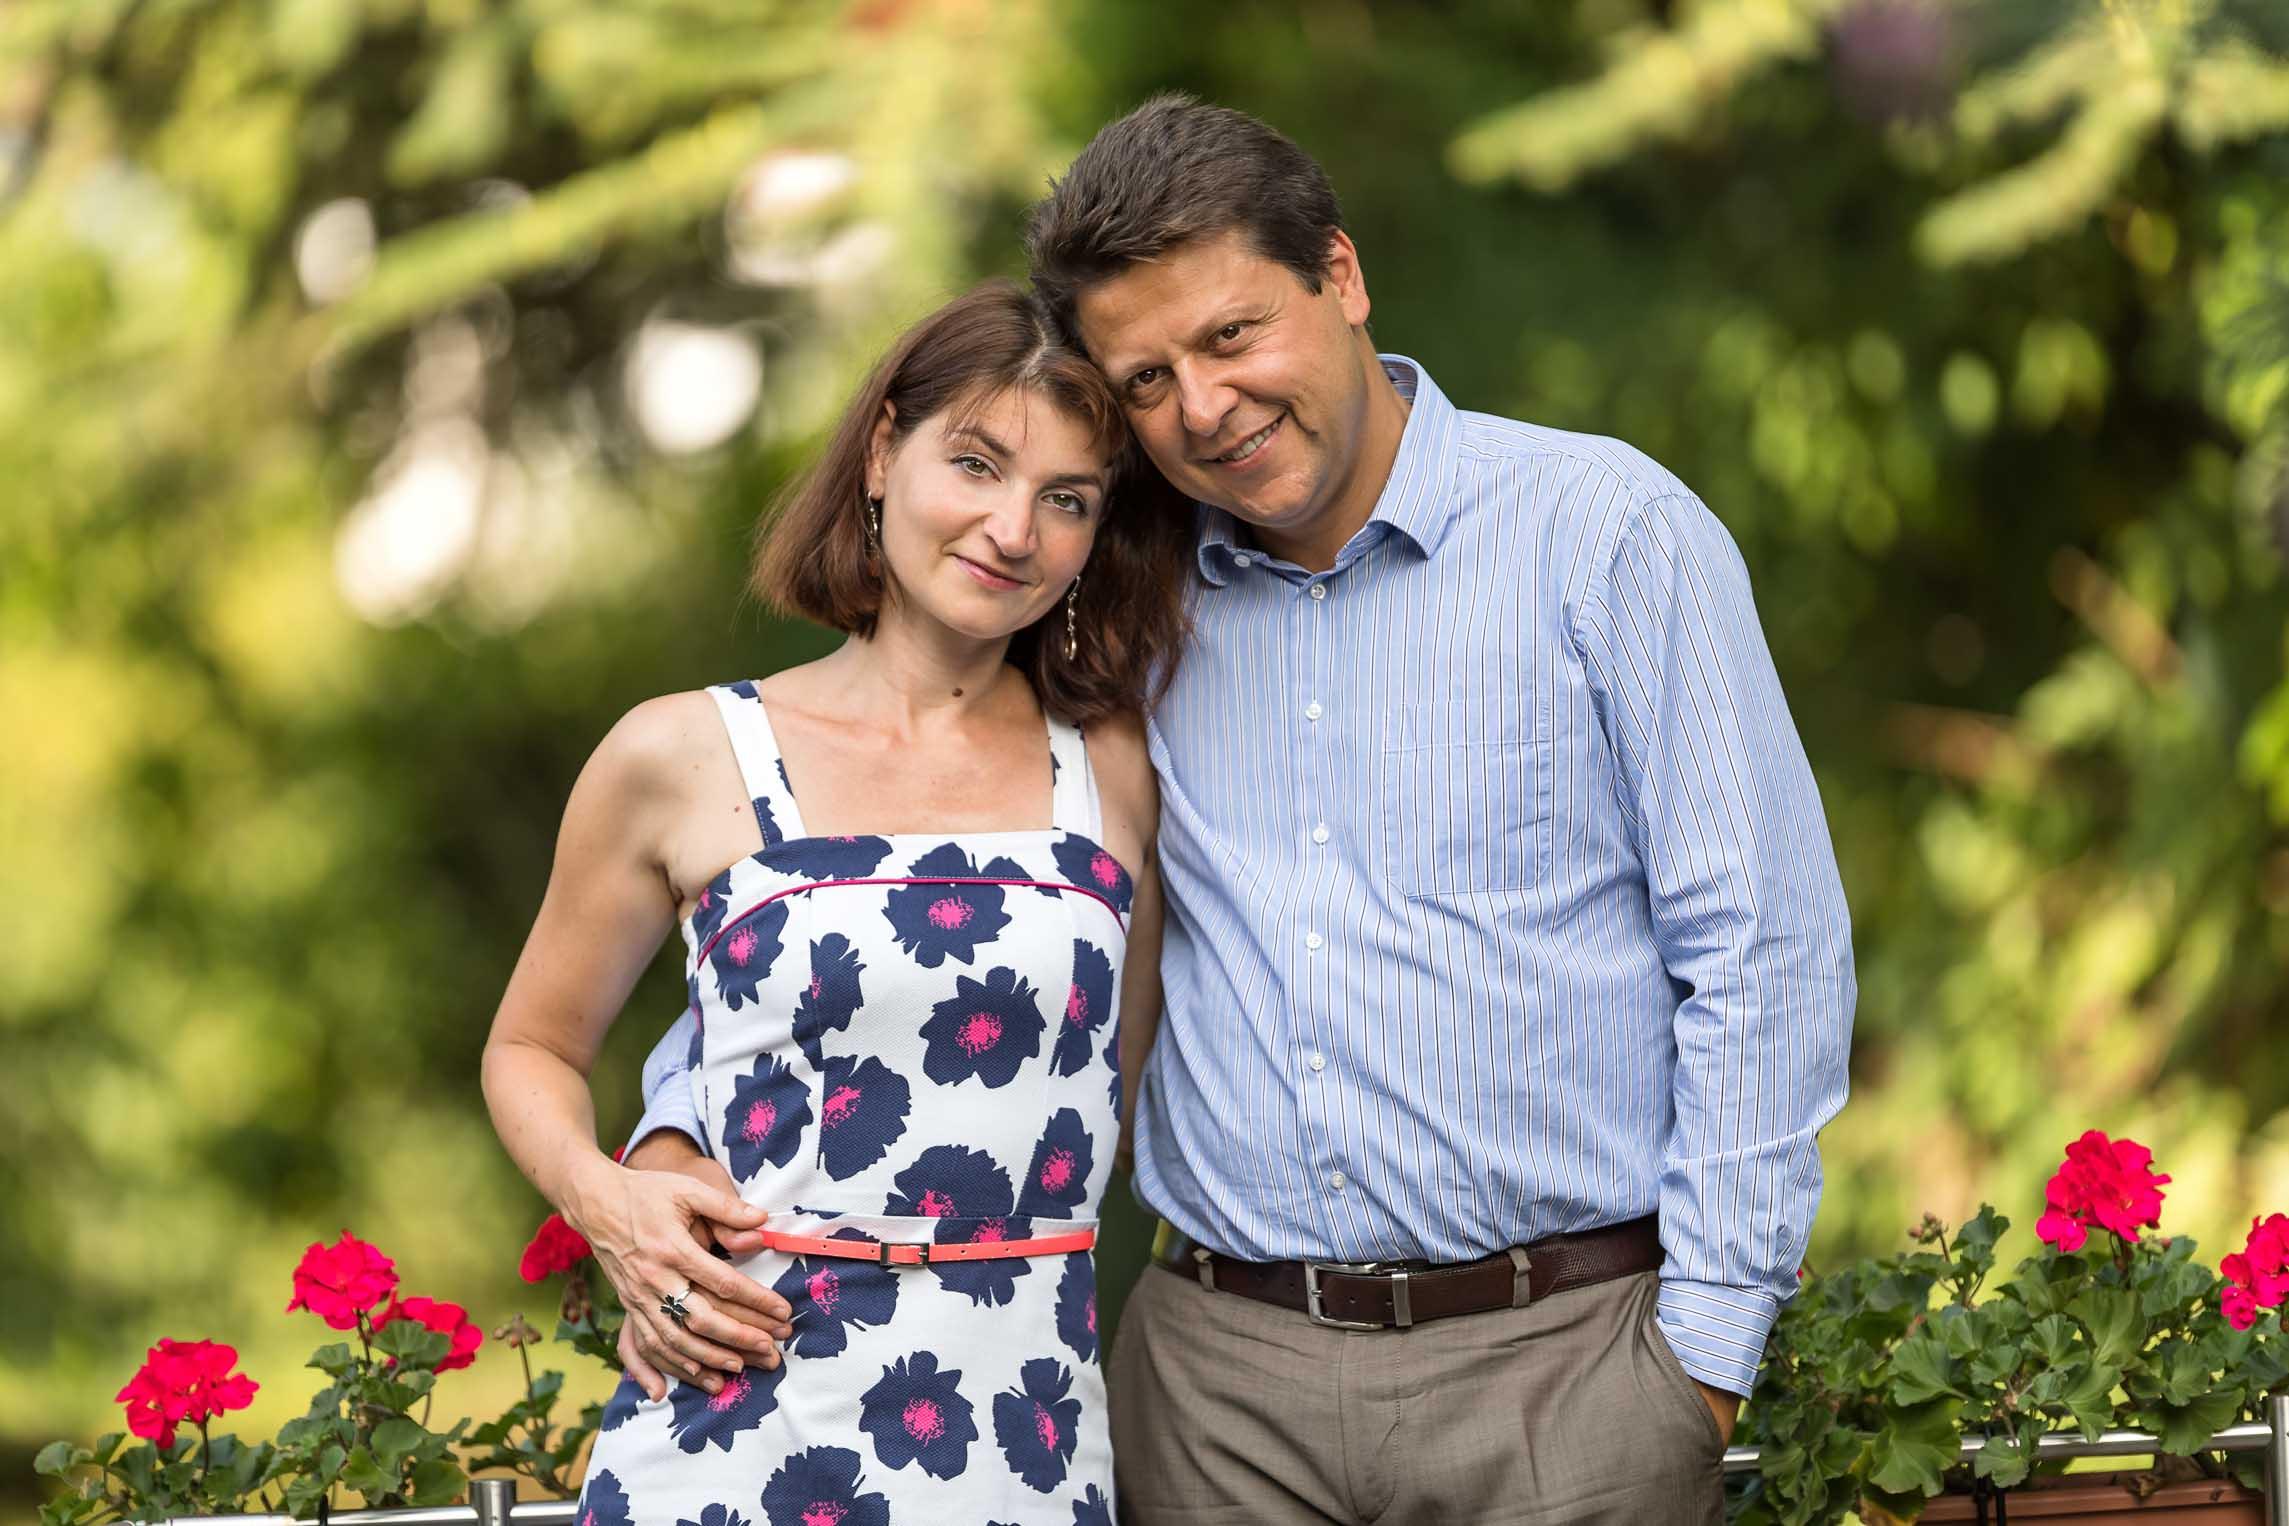 seance-photo-couple-intime.jpg